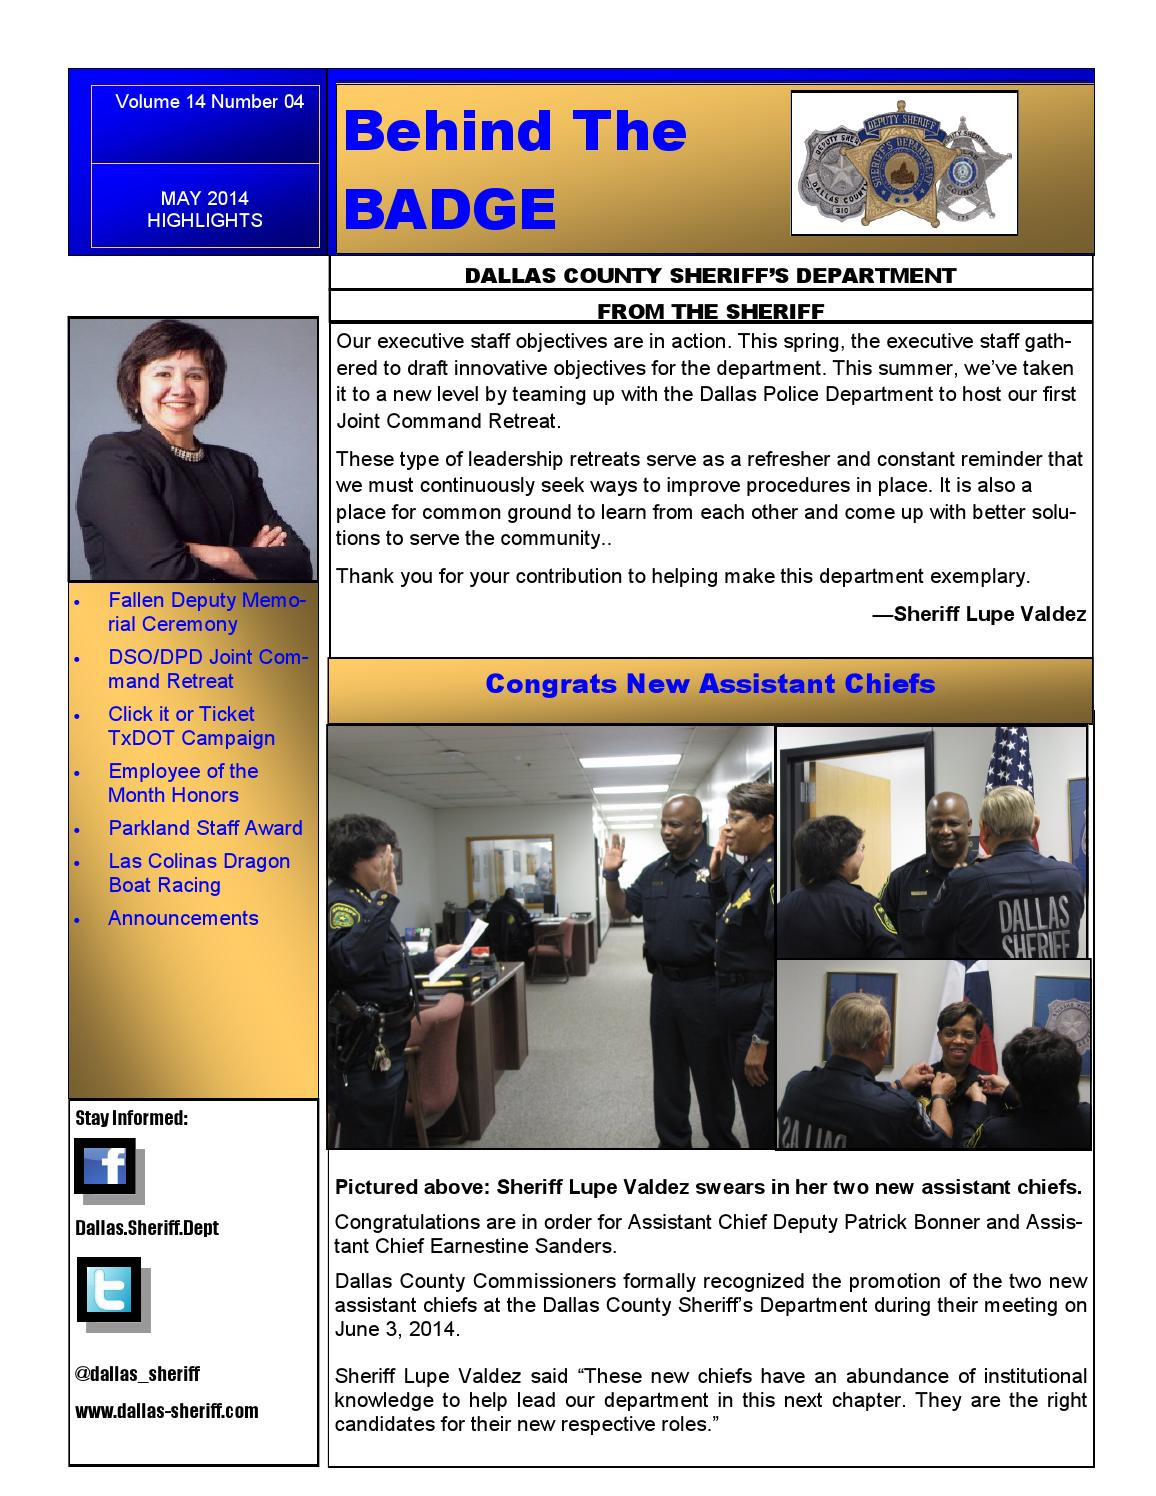 Behind the Badge: May 2014 Highlights by Dallas County